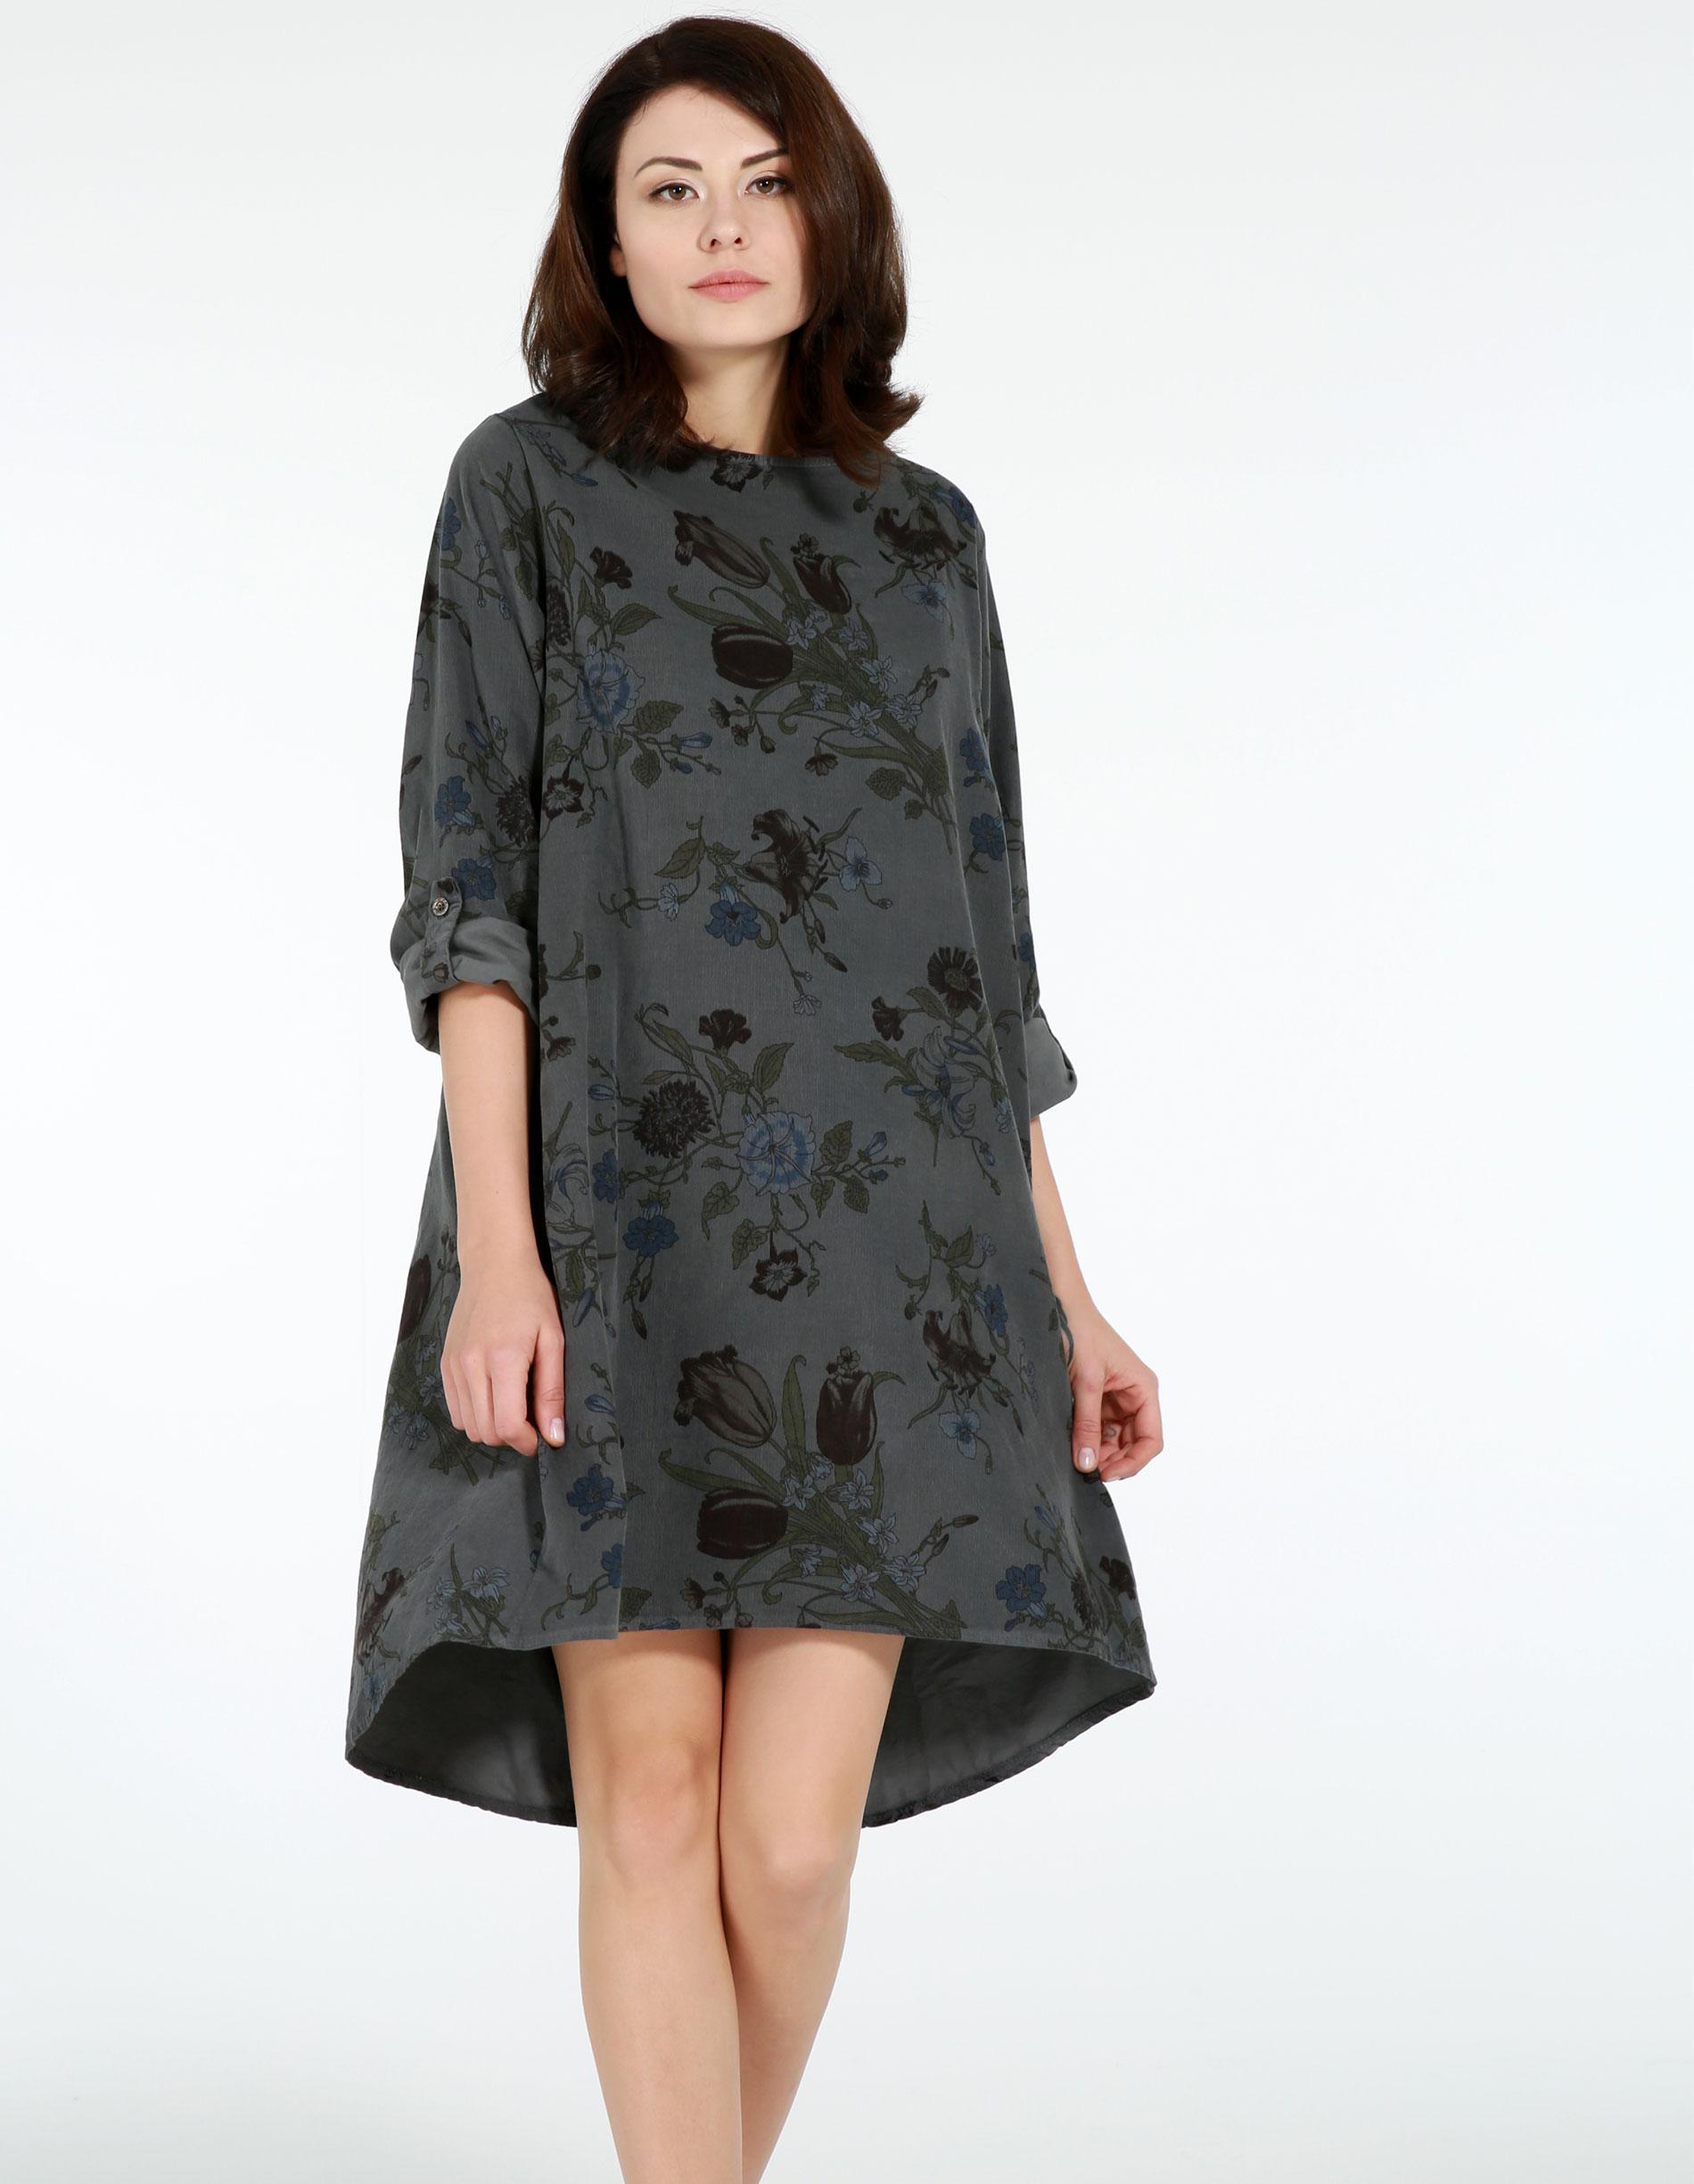 Sukienka - 4-4125 PIOMBO - Unisono